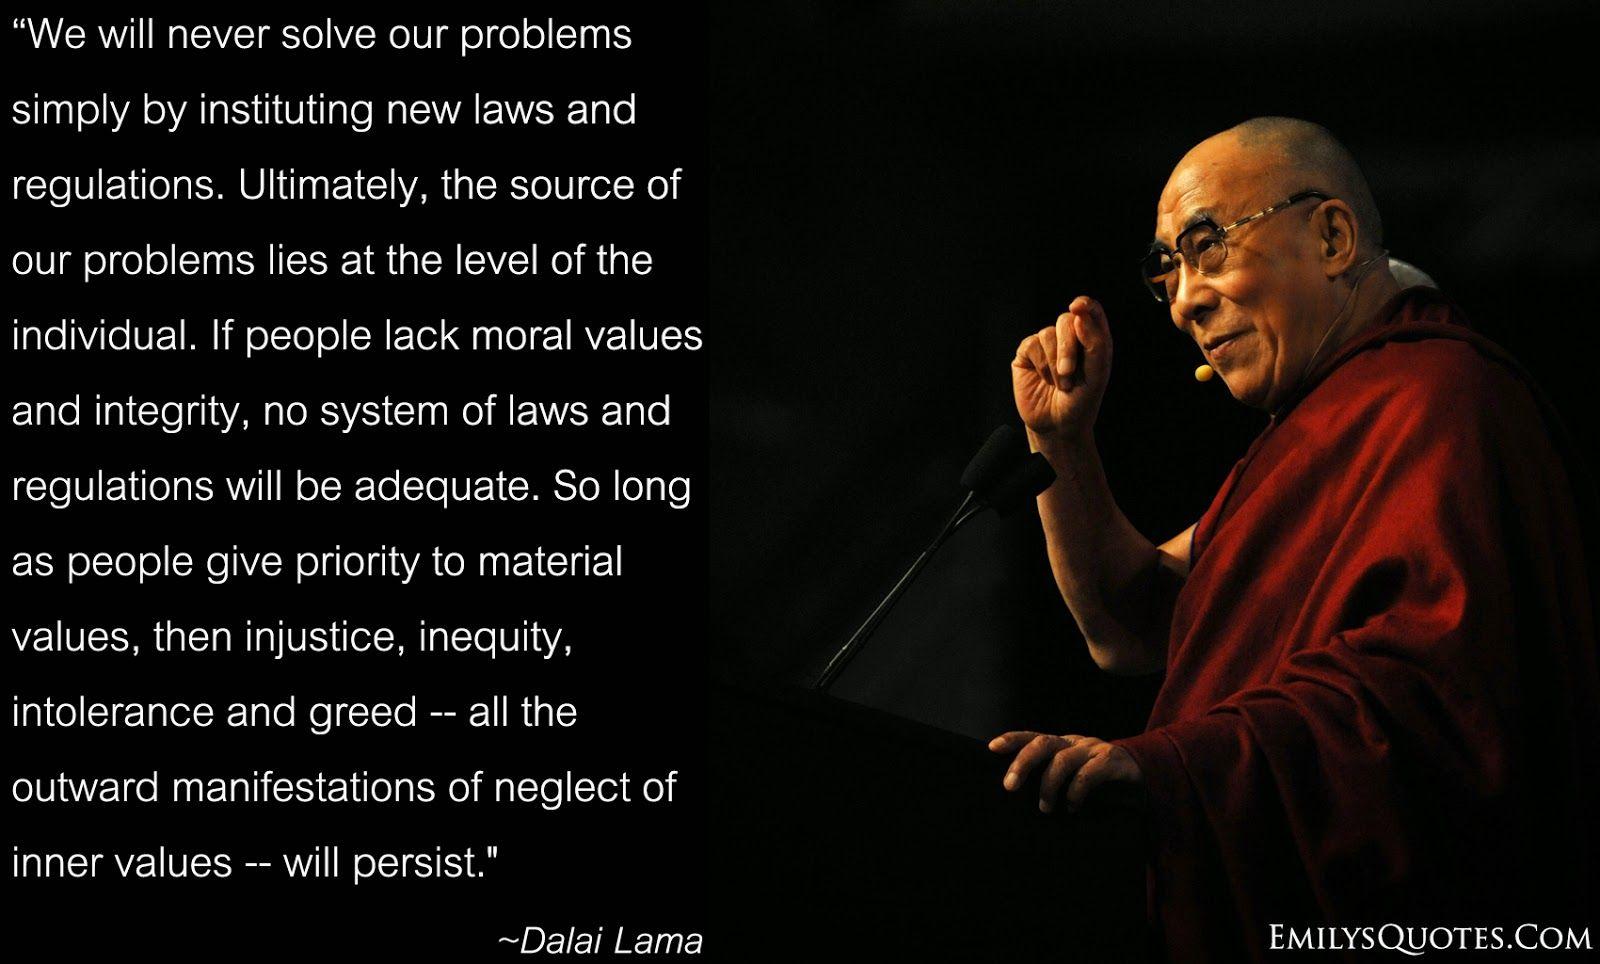 Dalai Lama Wisdom Quotes | Wise Motivational Inspirational Quotes ...